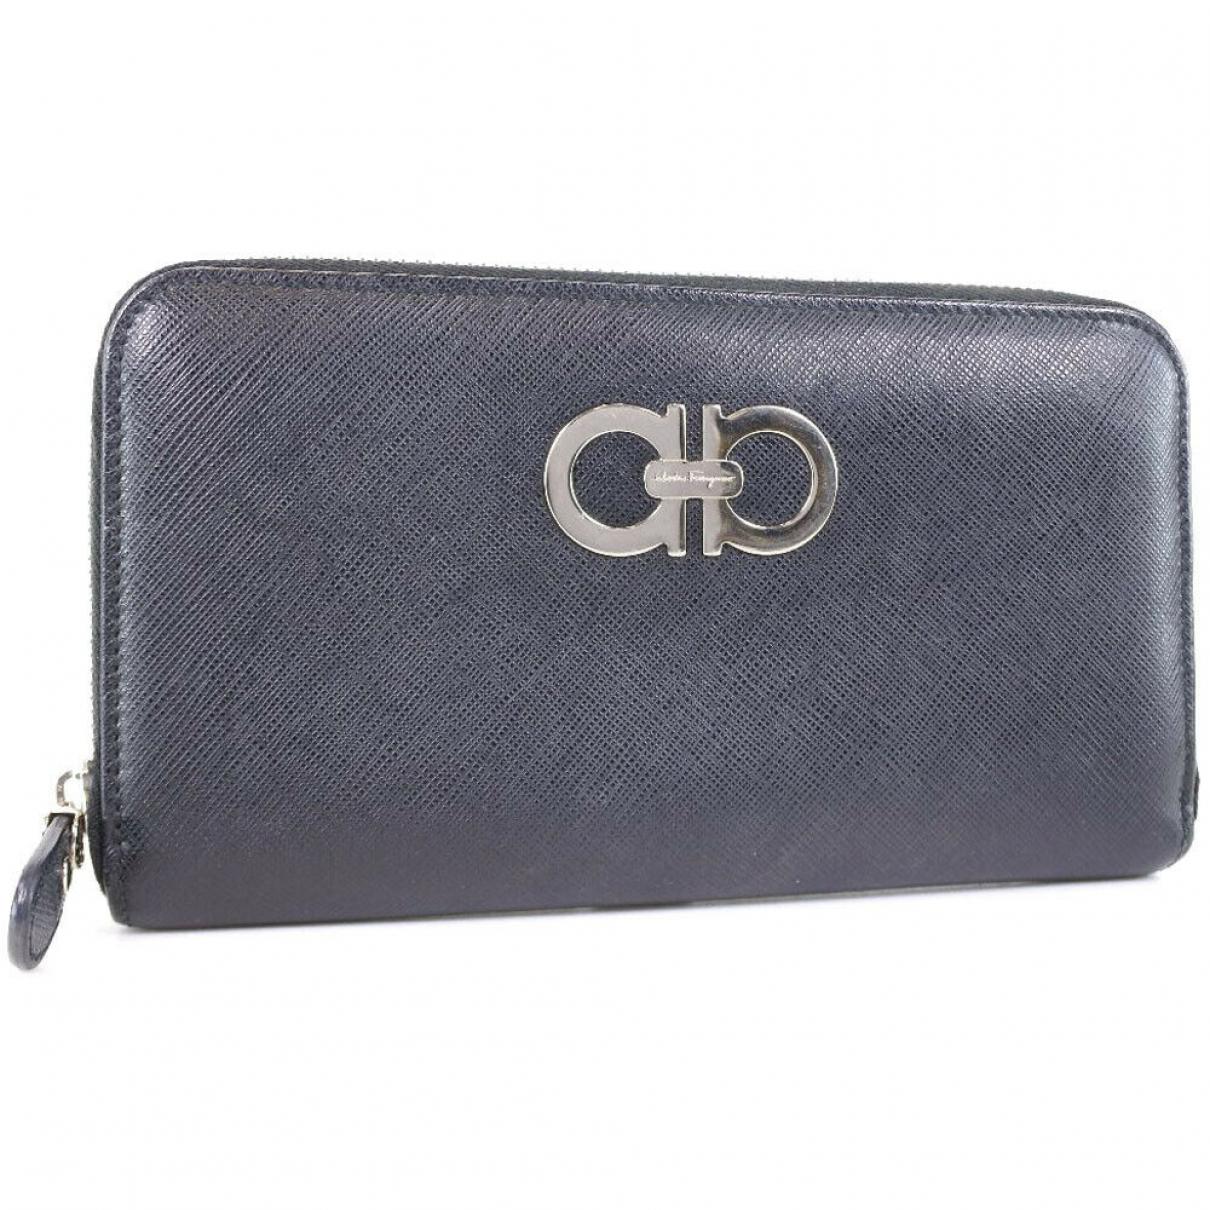 Salvatore Ferragamo \N Black Leather Purses, wallet & cases for Women \N